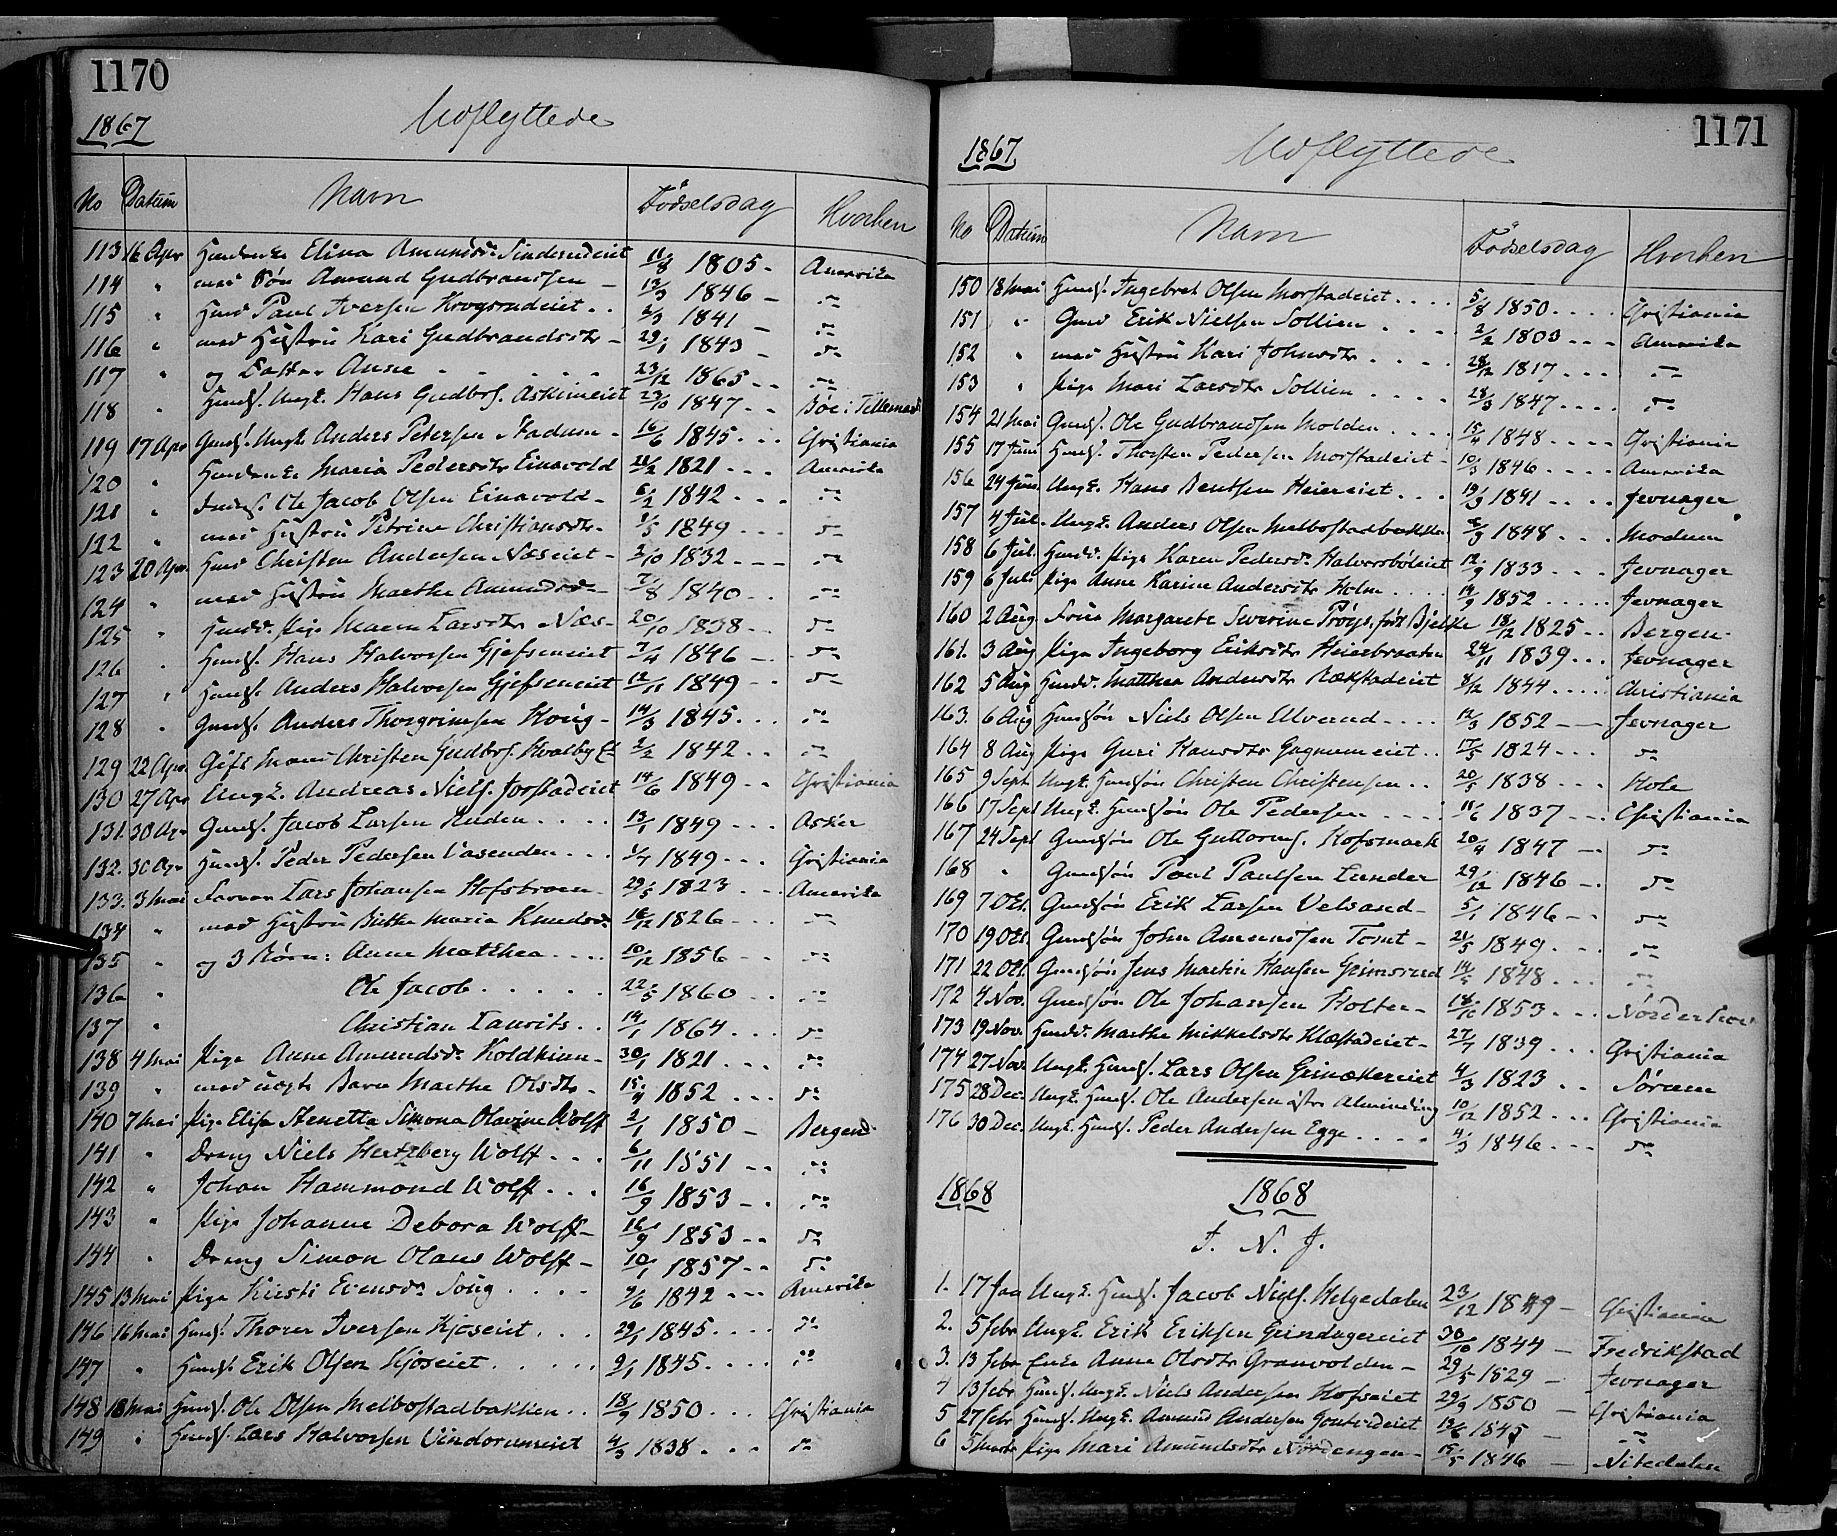 SAH, Gran prestekontor, Ministerialbok nr. 12, 1856-1874, s. 1170-1171